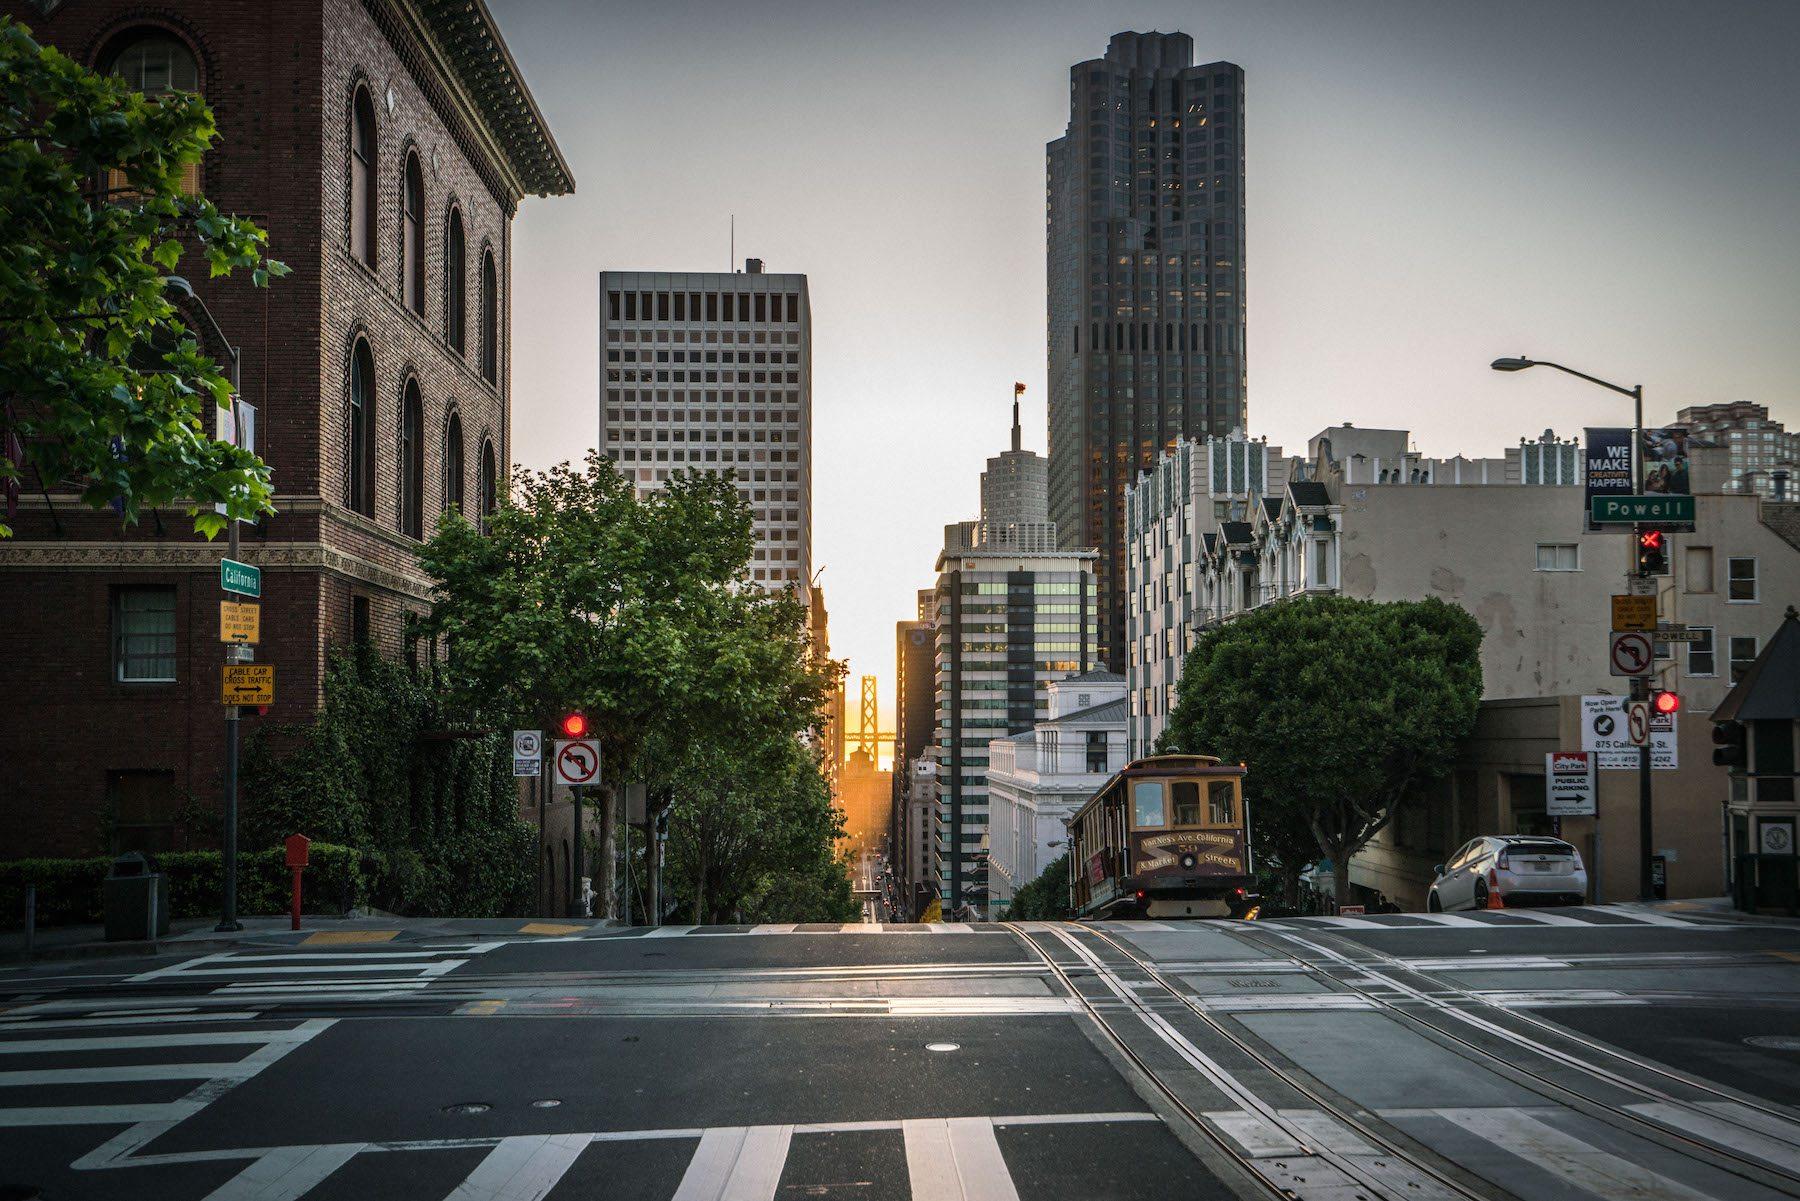 """Sun shines through the buildings downtown as a trolley descends down California."" Photo: Jake Landon, @jakelandon. #SFGuide Featured Photographer."